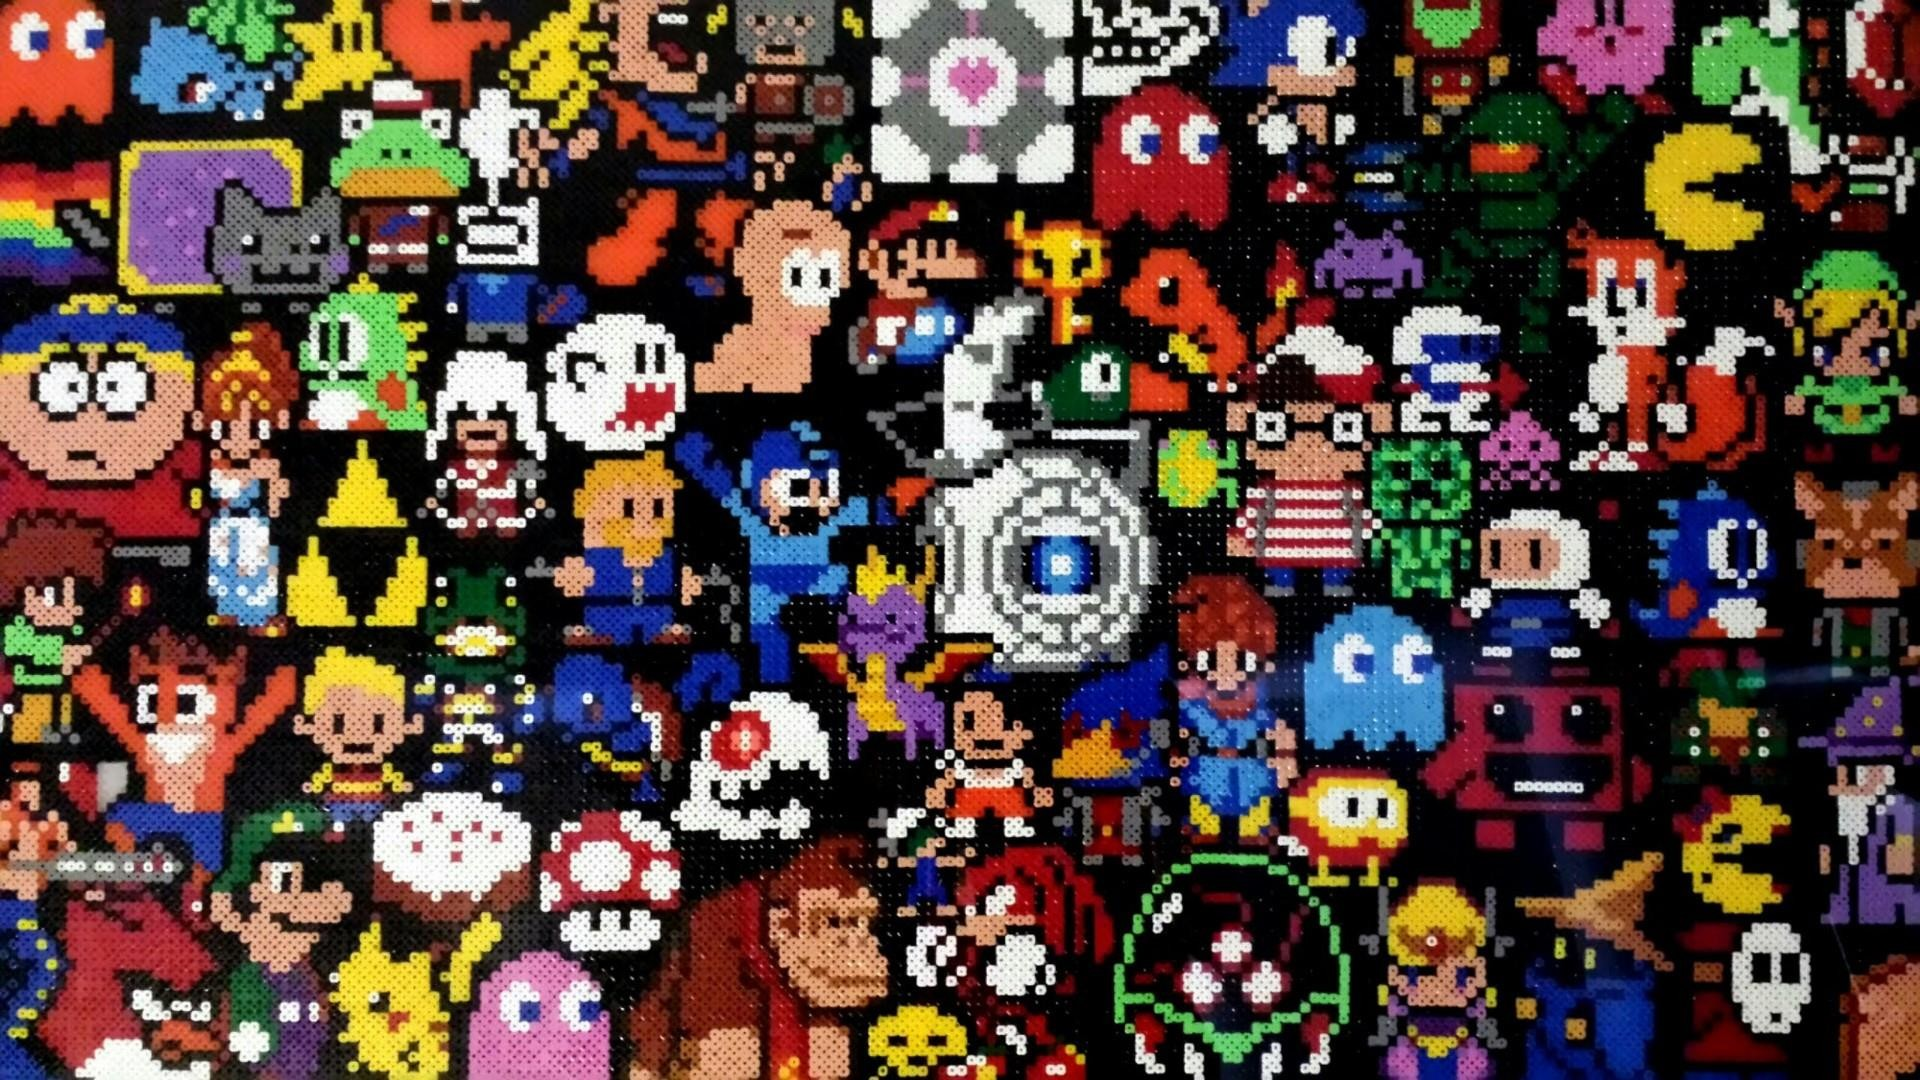 Retro Games Wallpaper posted by Samantha Johnson 1920x1080